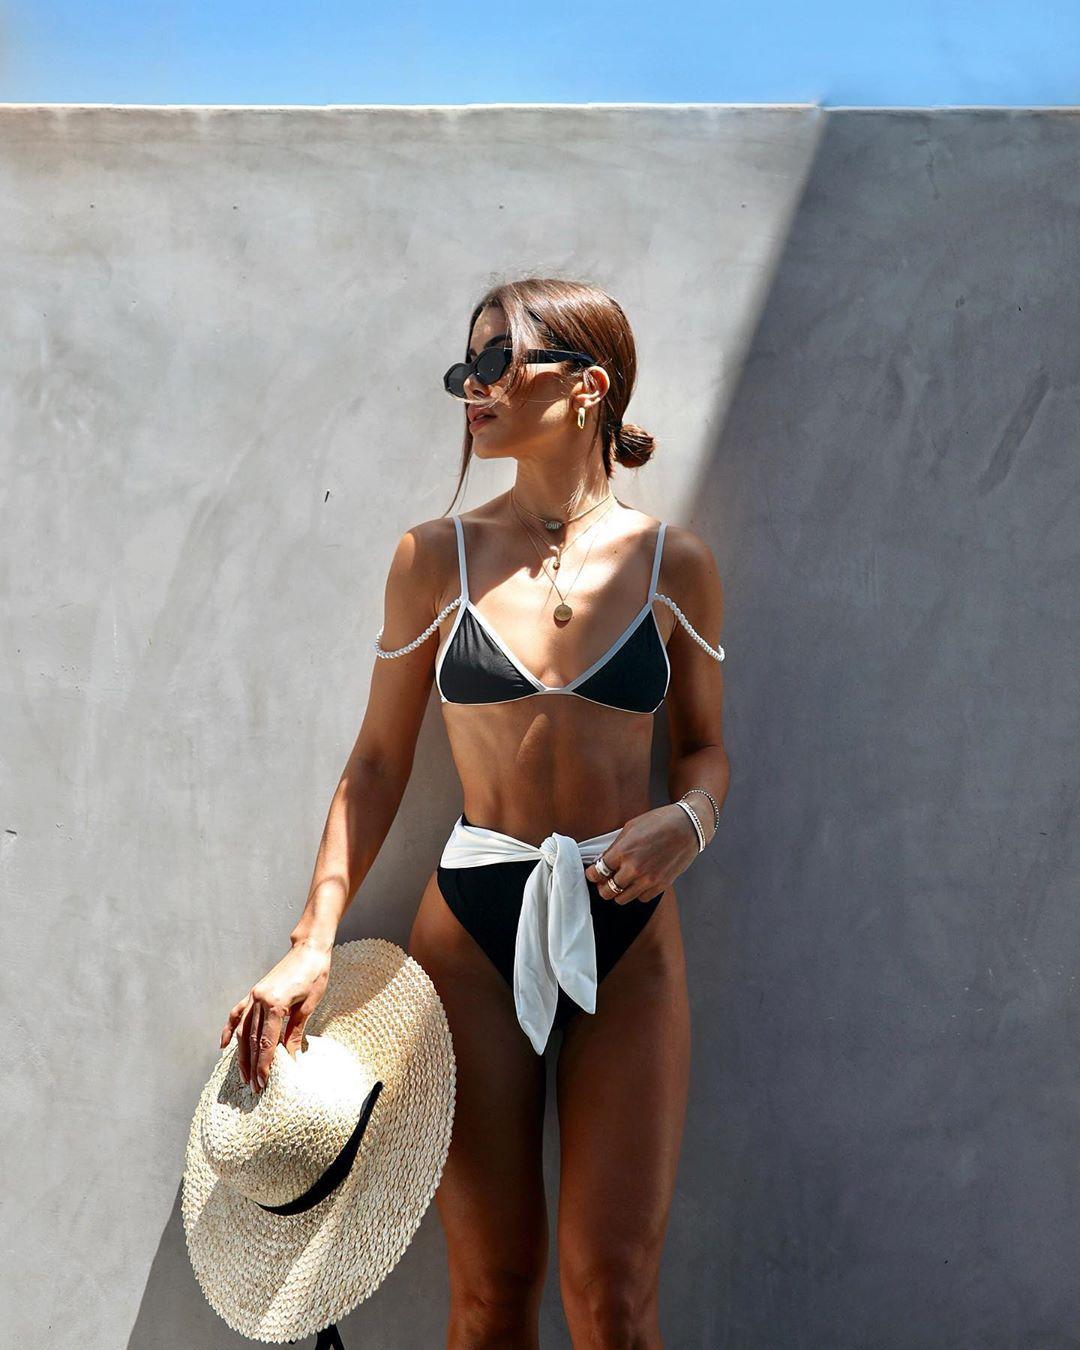 Camila Coelho donning a Plunging black Camila Coelho bikini top with strappy and spaghetti straps